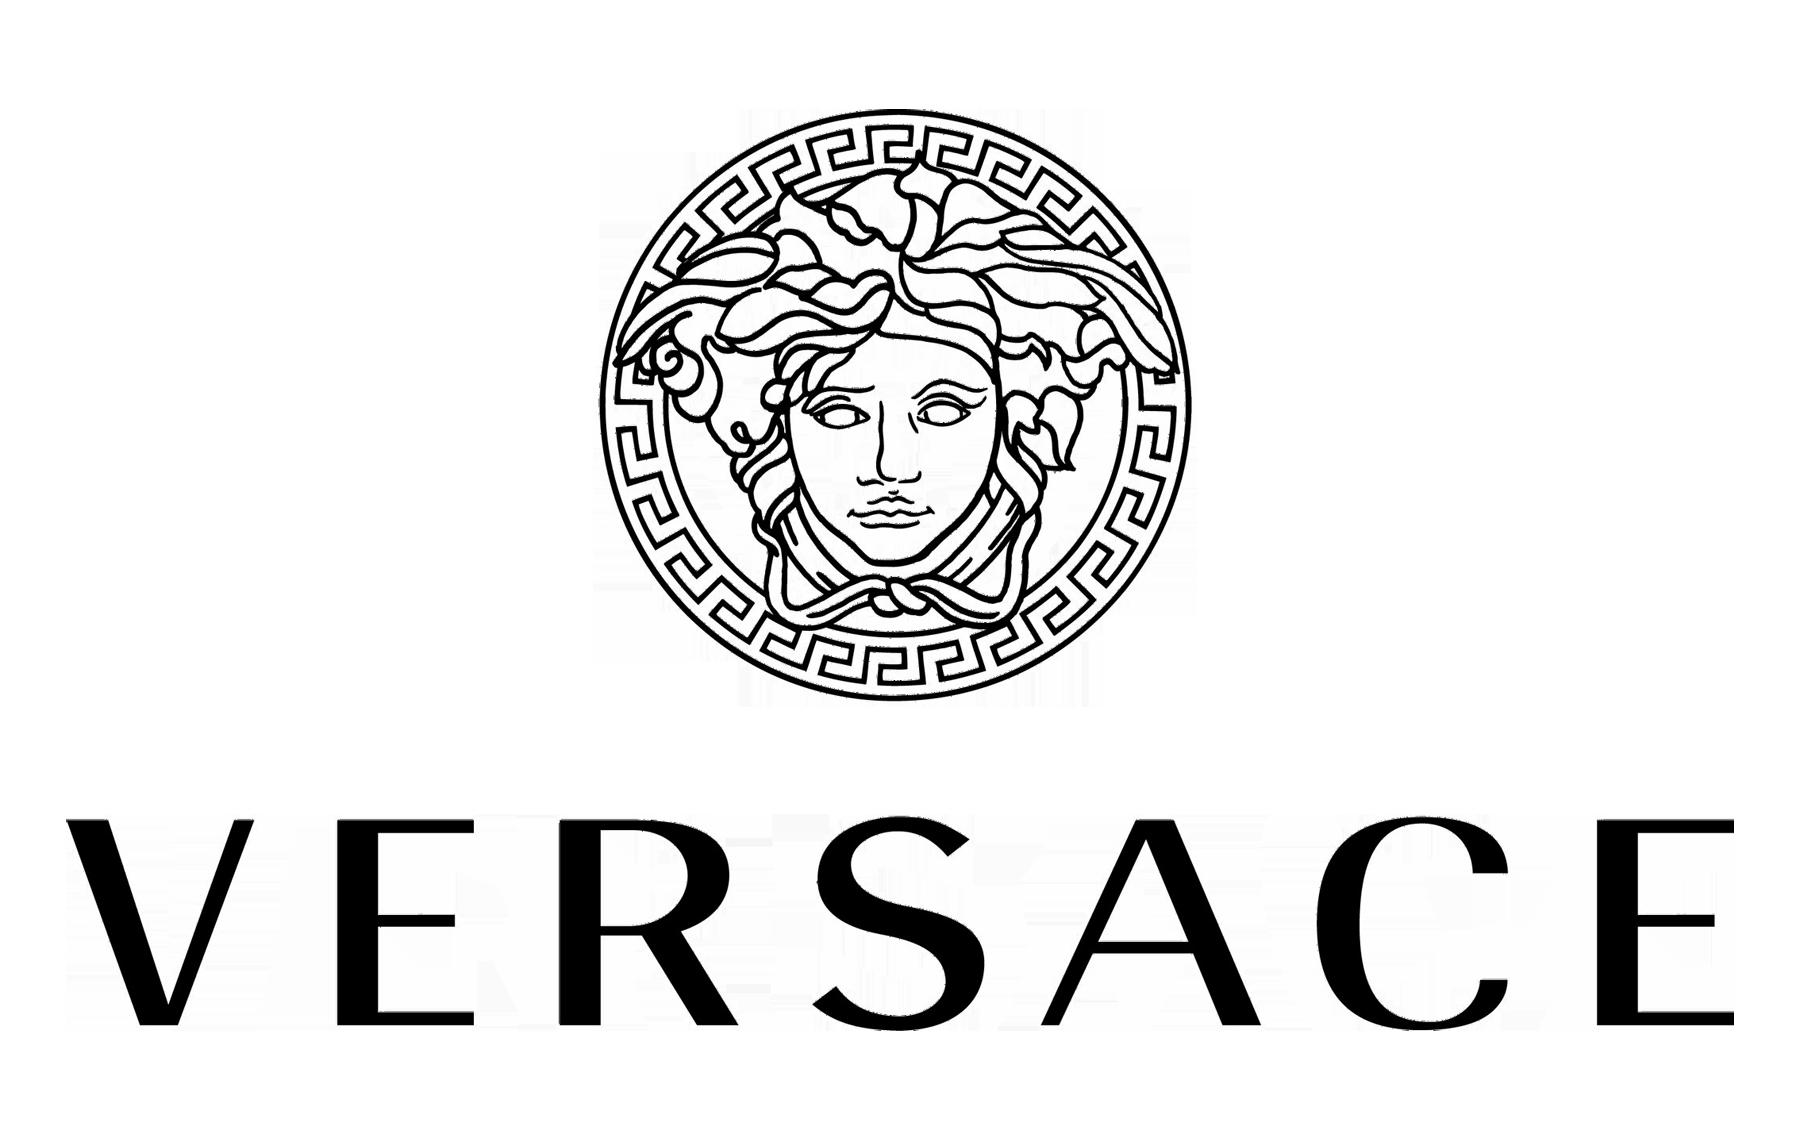 Versace logo versace symbol meaning history and evolution versace logo buycottarizona